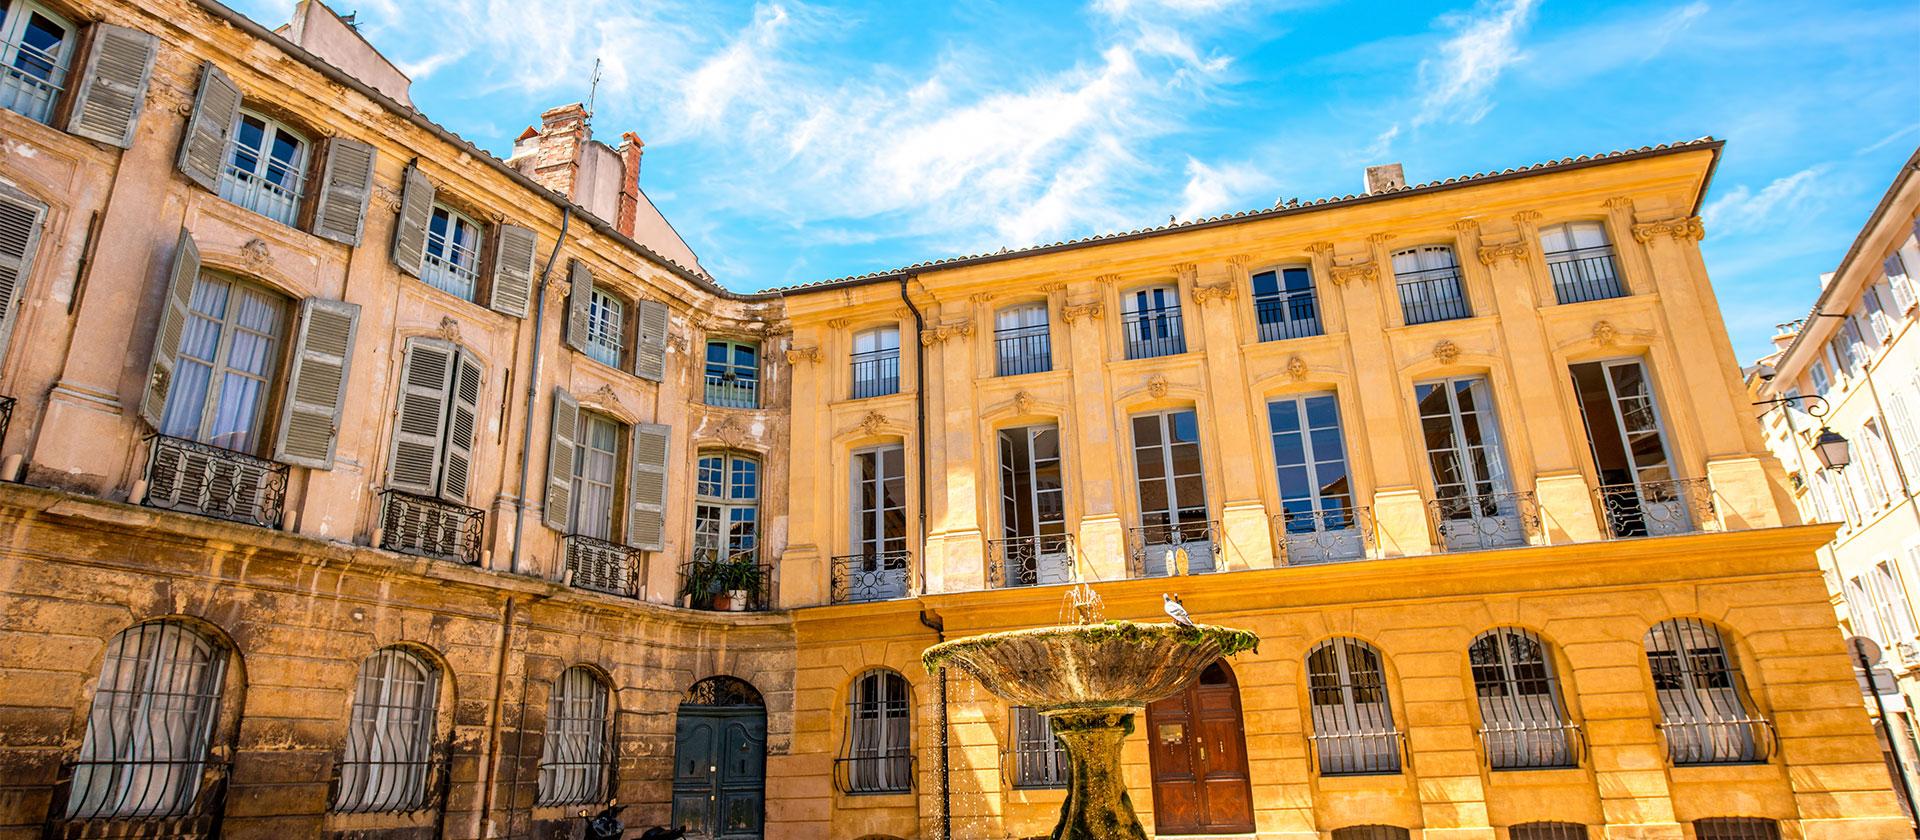 Espace Atypique Aix En Provence promo] 81% off odalys city le tholonet aix en provence